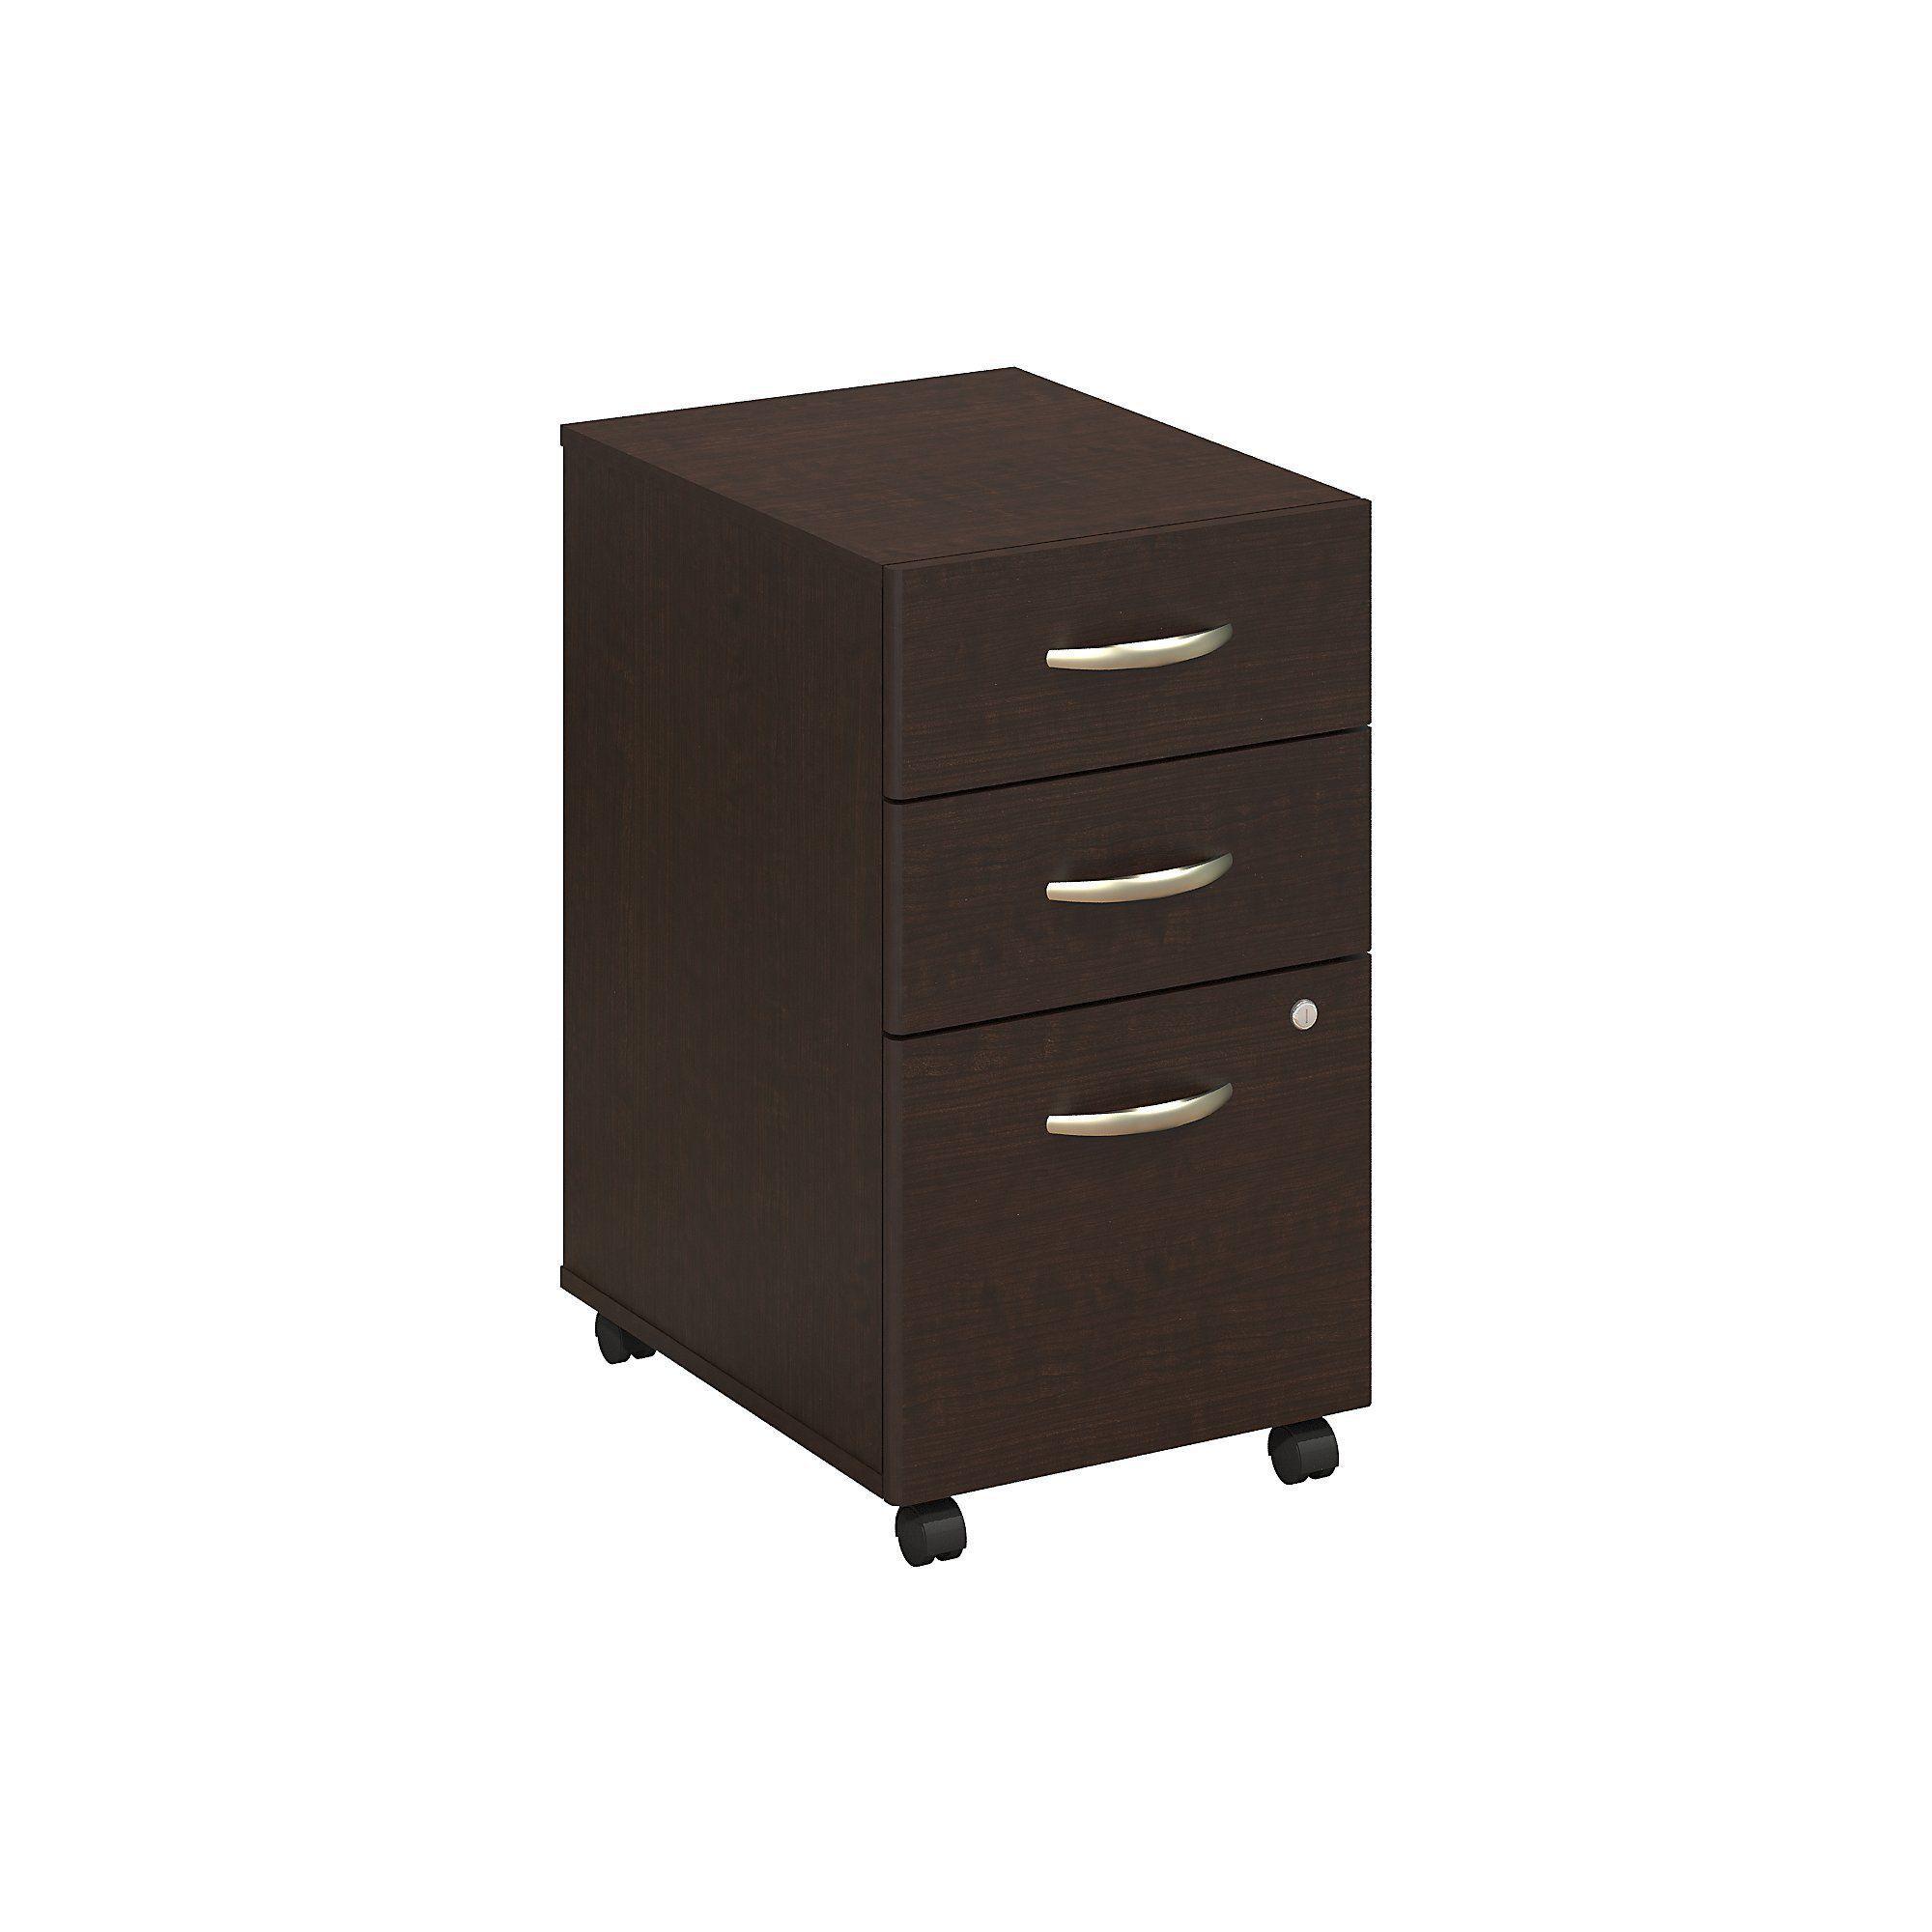 Bush Business Furniture Series C Mocha Cherry 3 Drawer Mobile Pedestal File  Cabinet By Bush Business Furniture